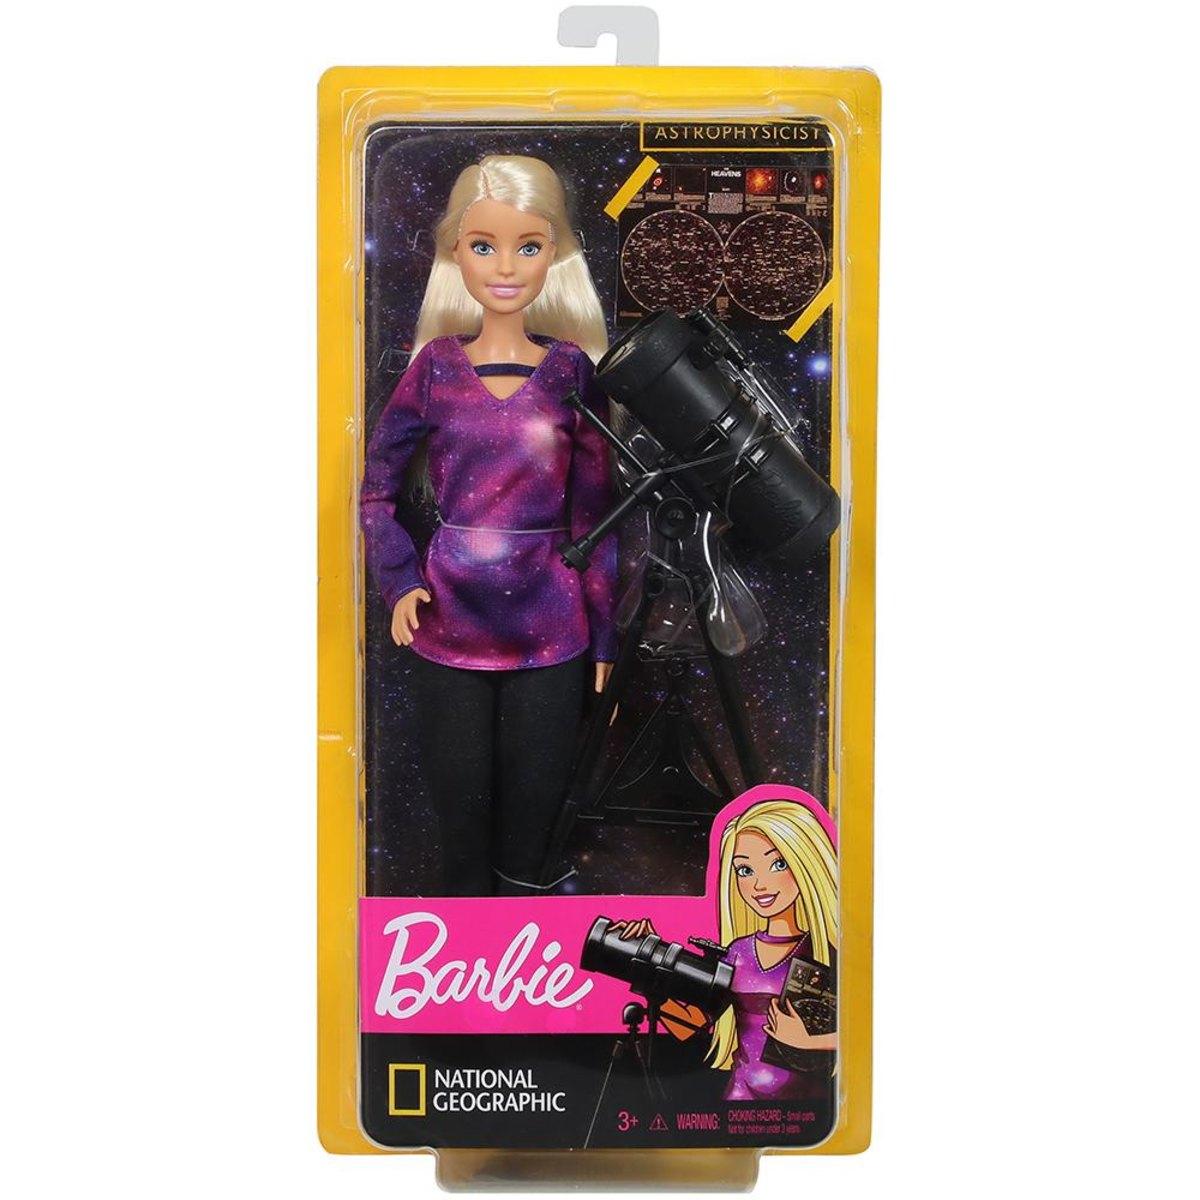 Boneca Barbie: Barbie National Geographic (Astrônoma) - Mattel